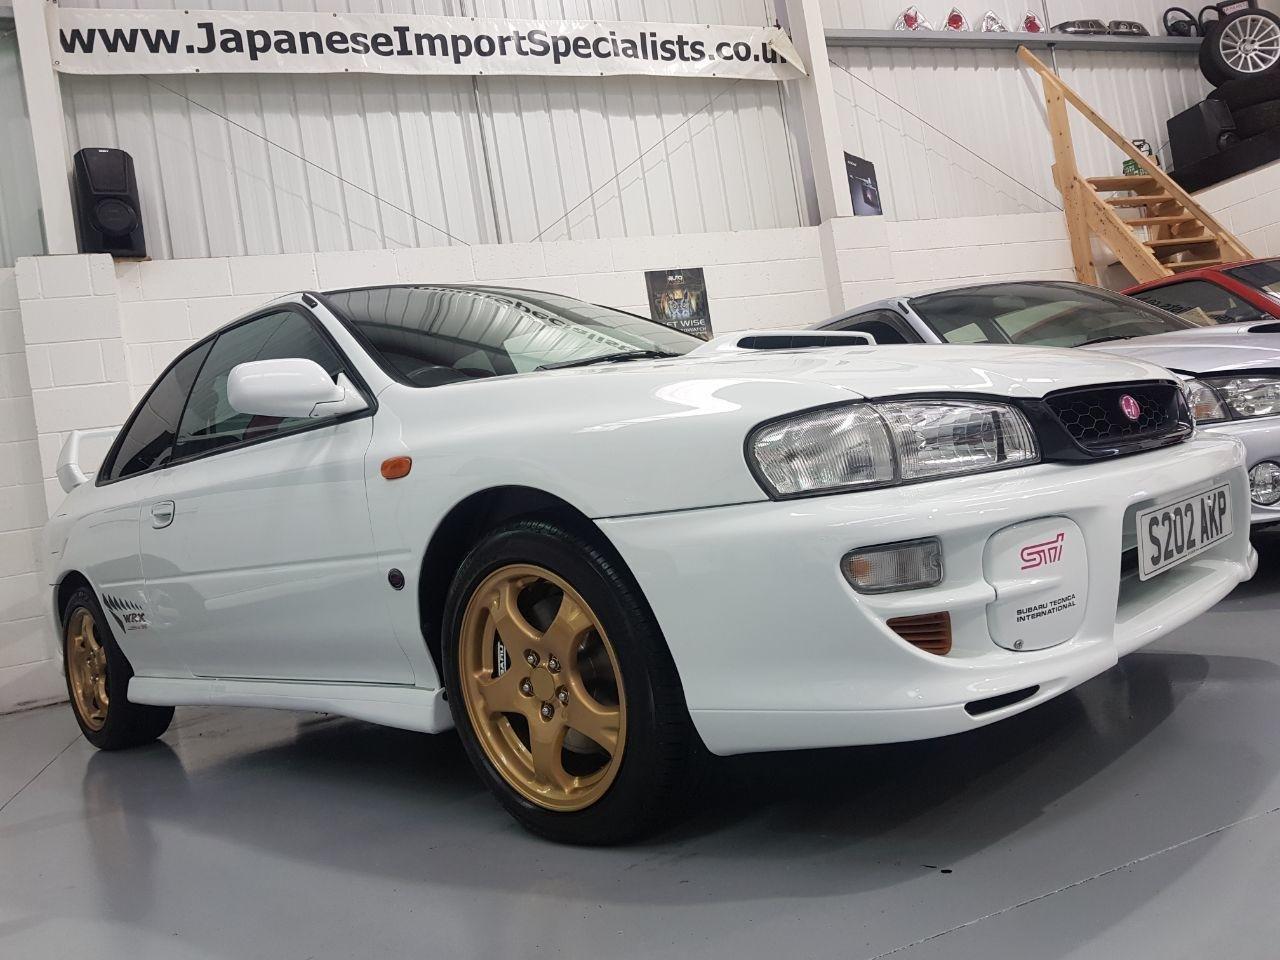 1998 Subaru Impreza 2.0 STI Type R Version 5 GC8 - 14984 MILES For Sale (picture 3 of 6)